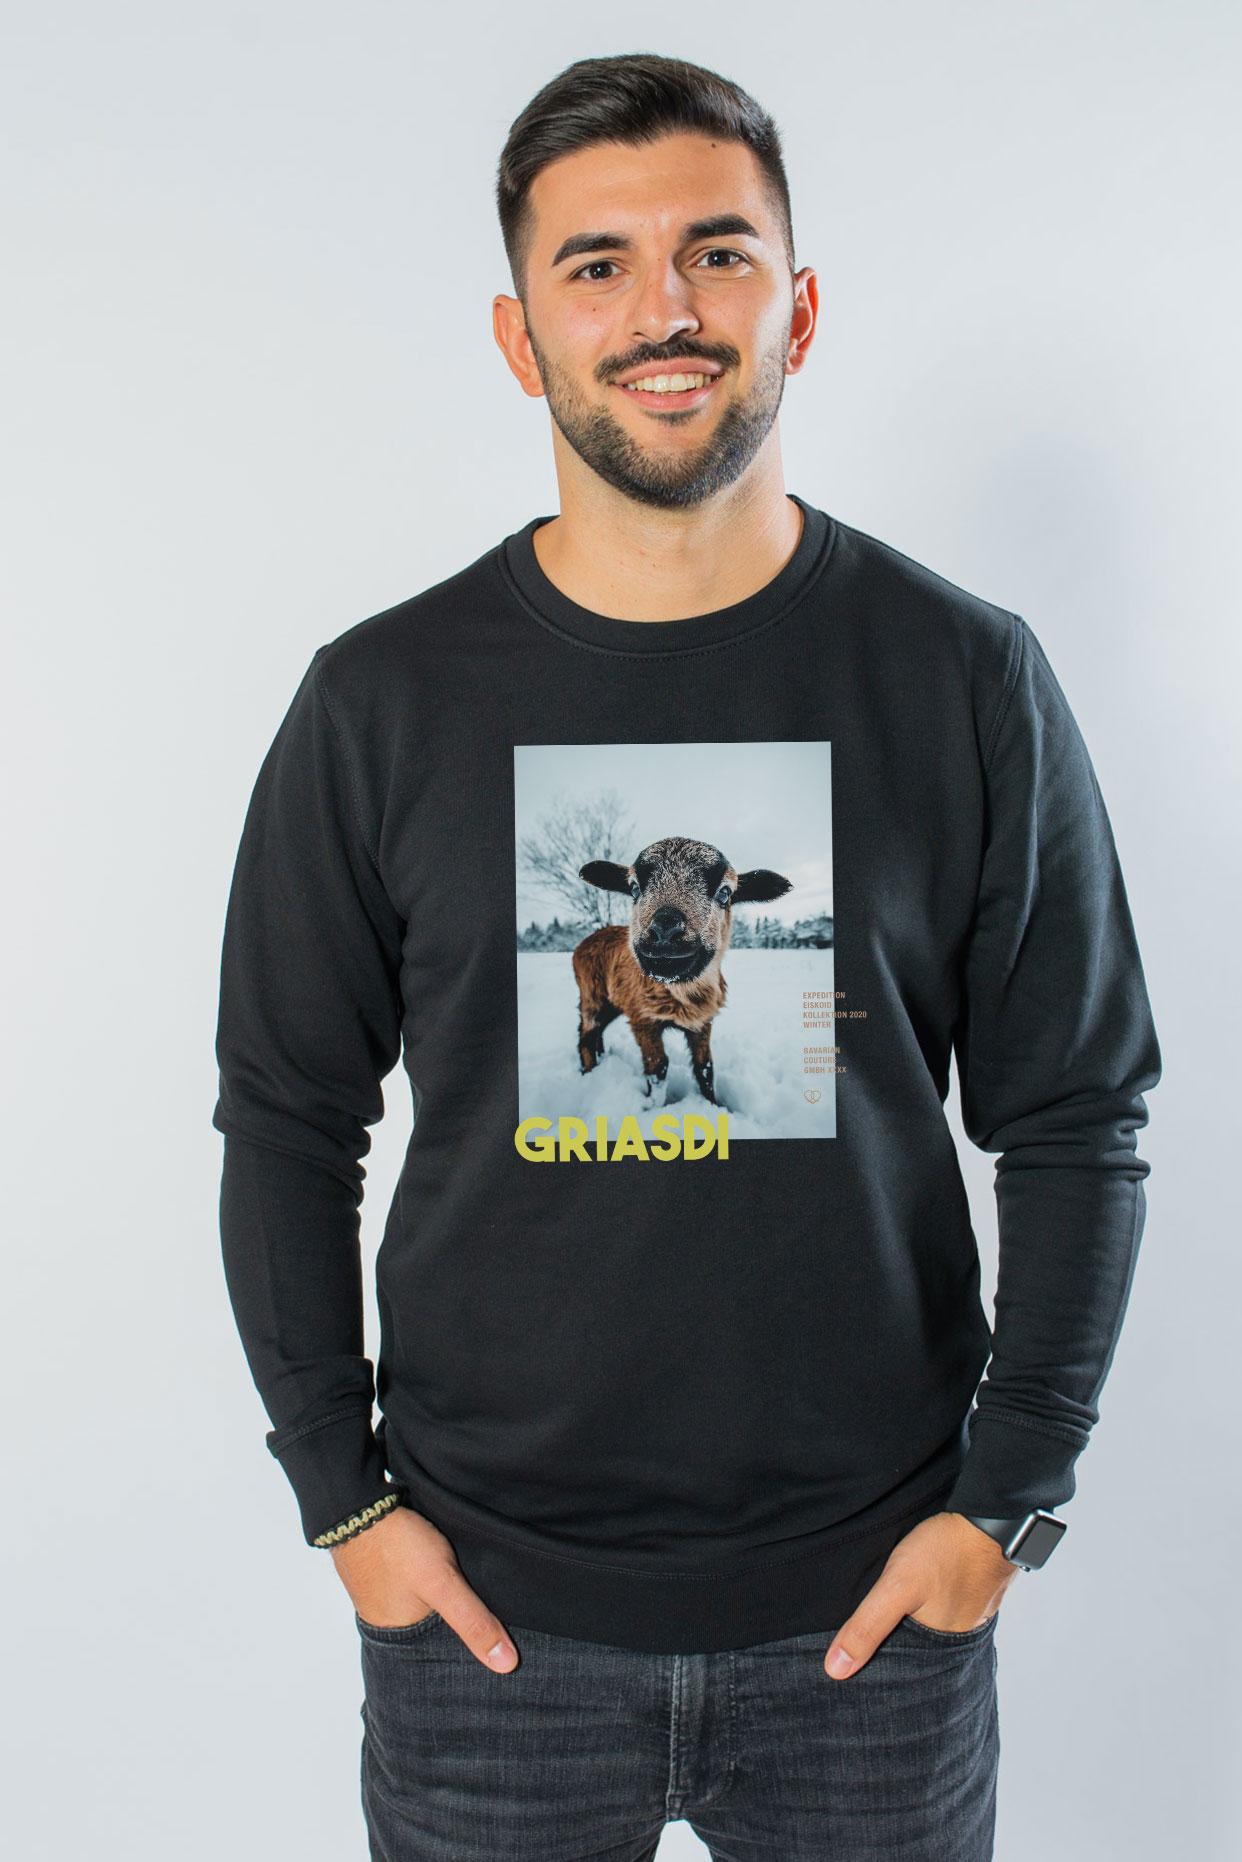 Griasdi Unisex Sweater